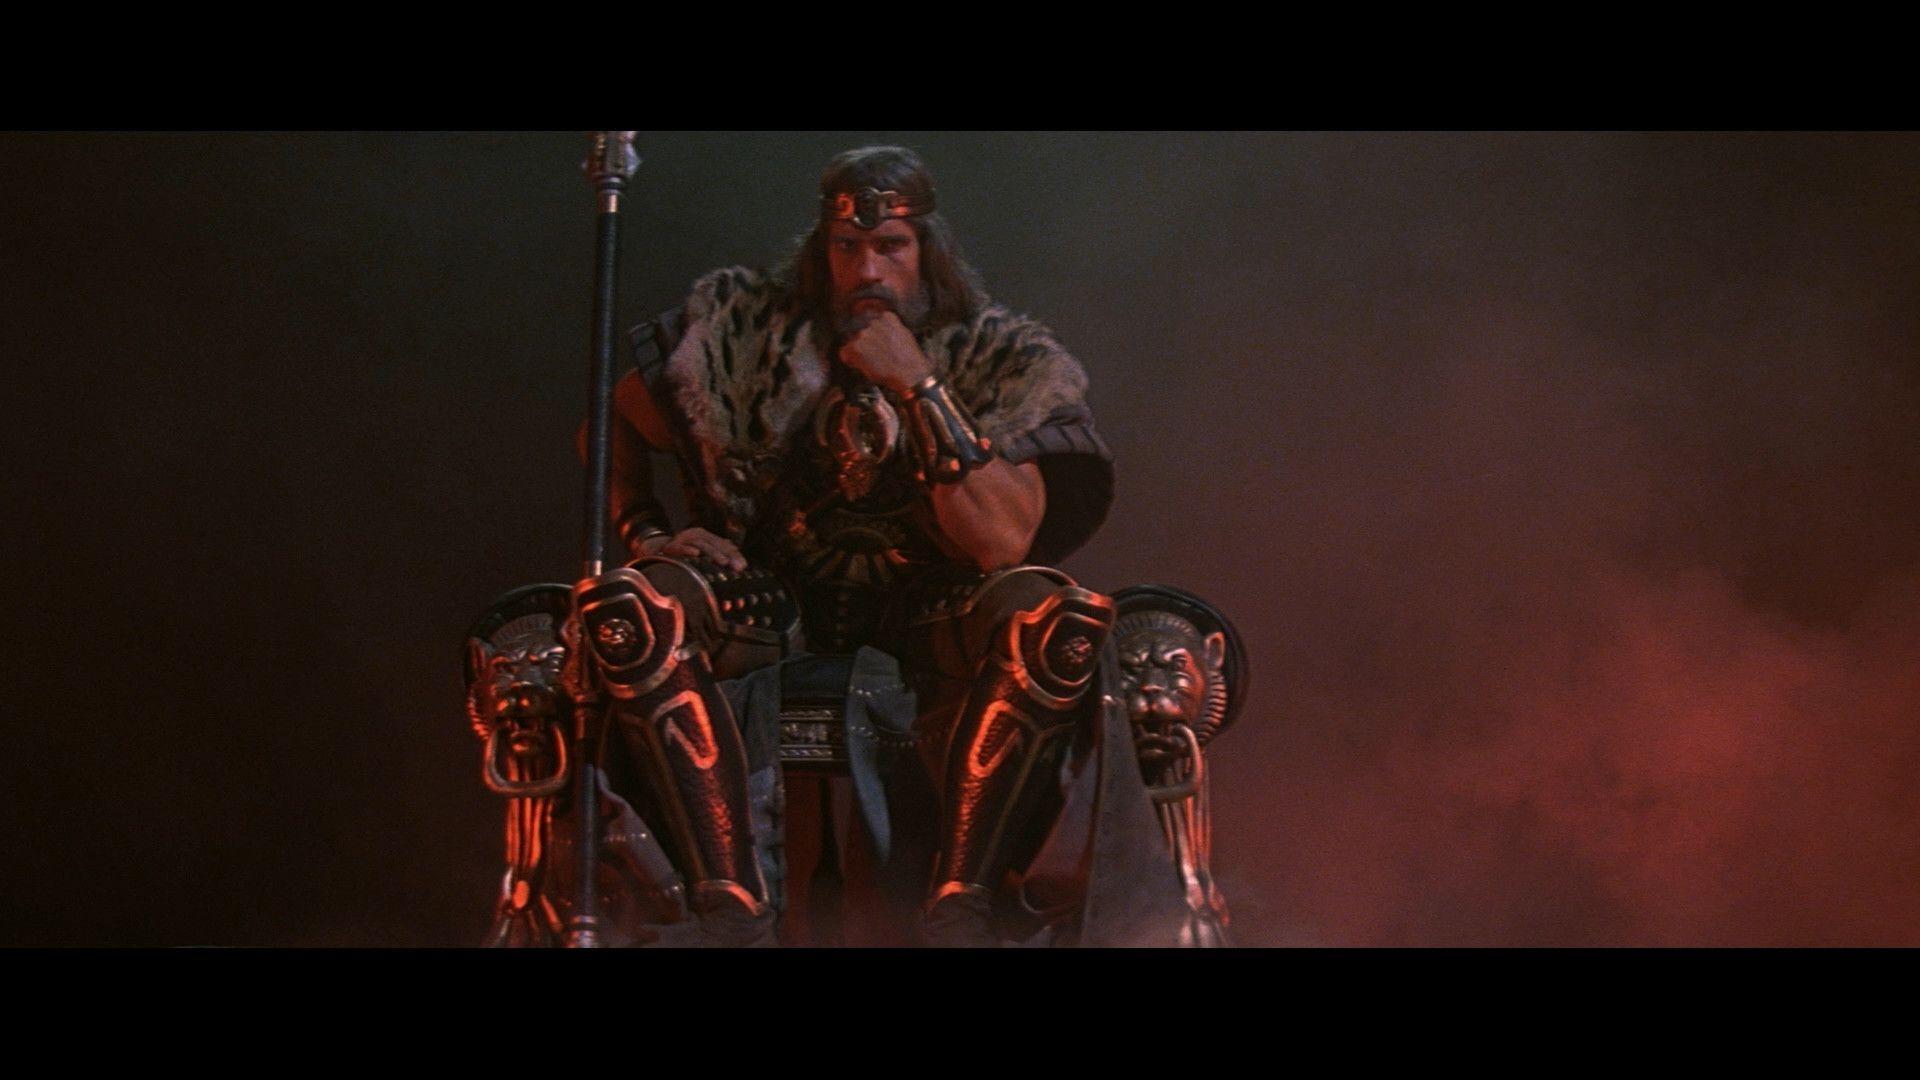 Conan The Barbarian Wallpapers - Wallpaper Cave